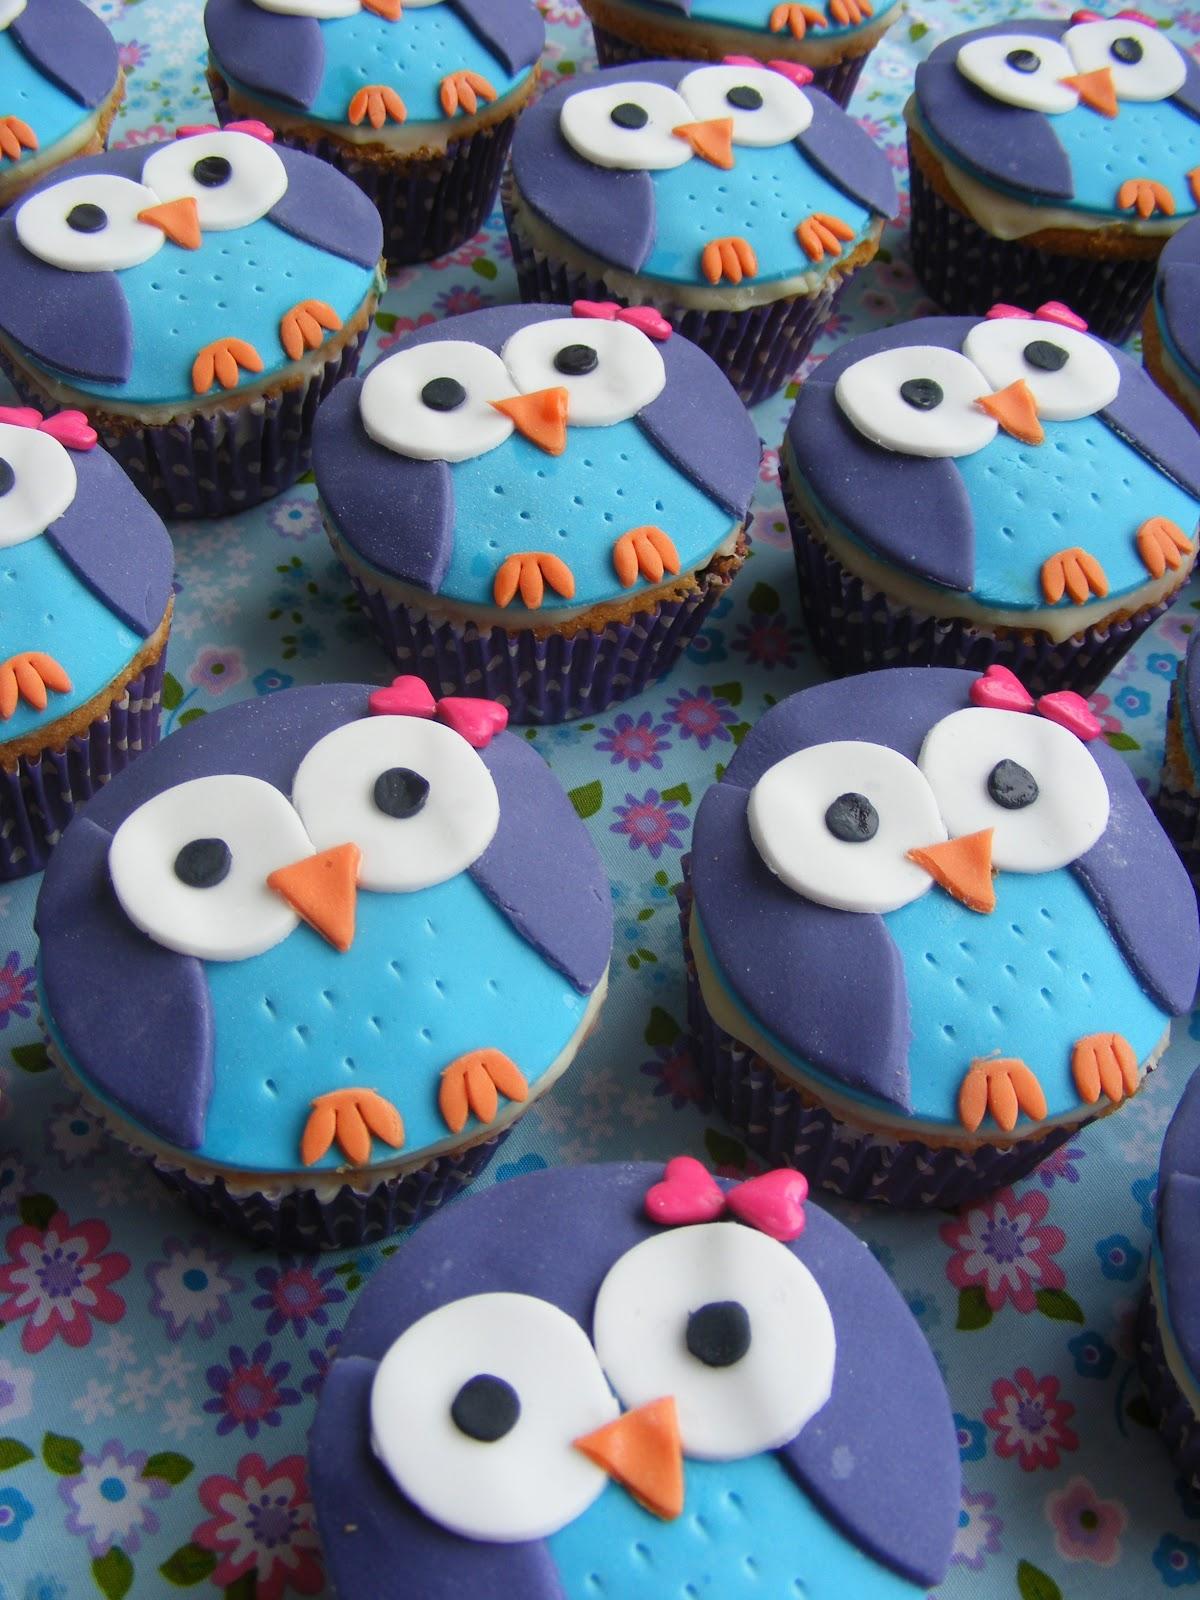 Love Ju Uiltjes Cupcakes